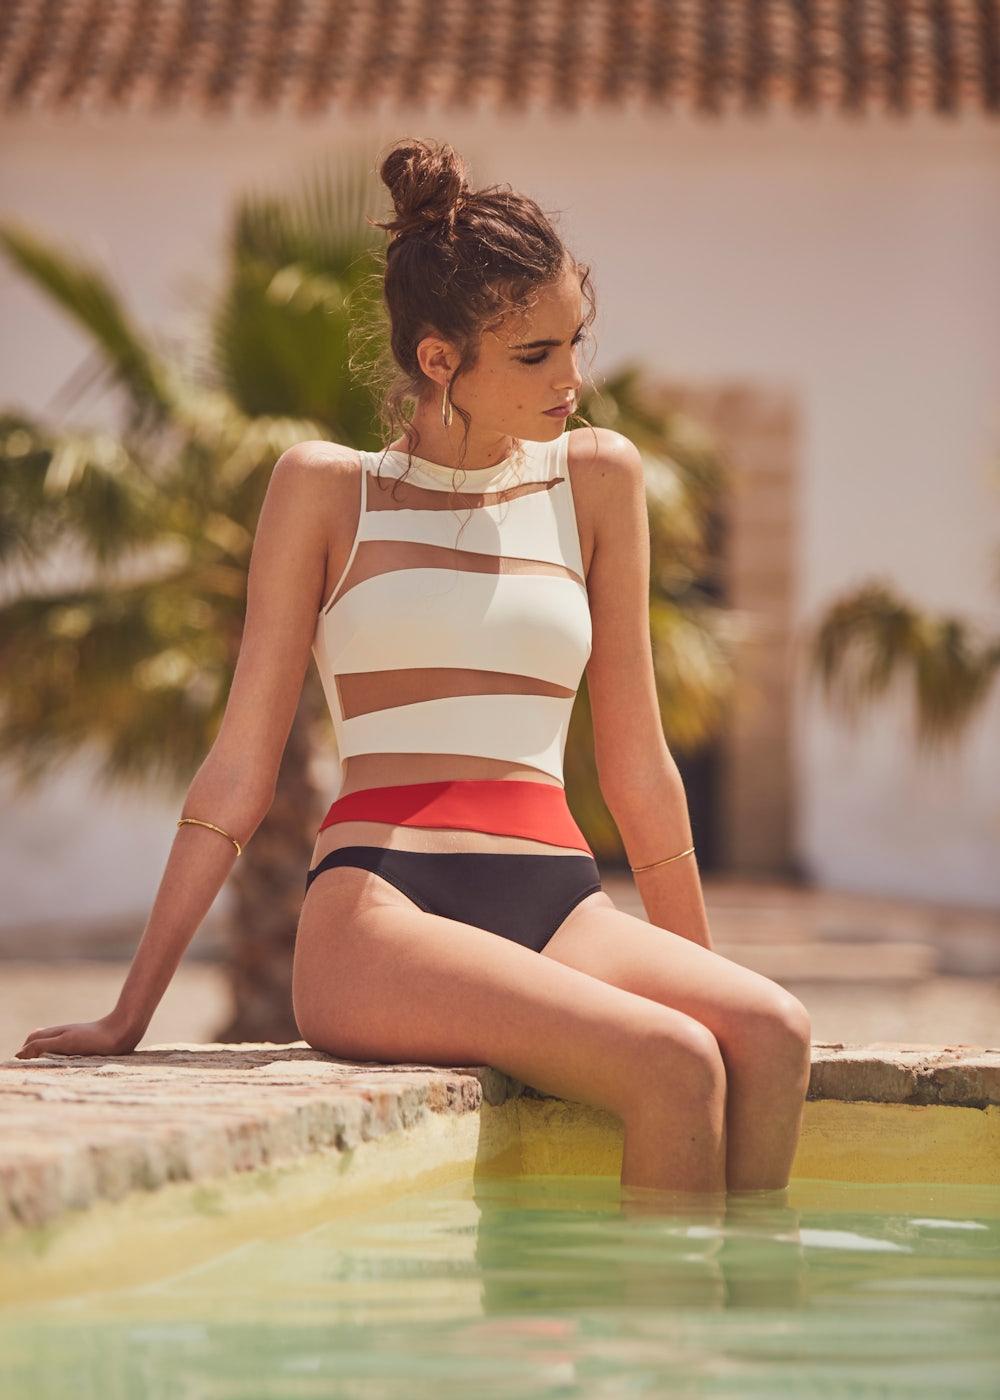 Señorita Mesh - Valentina